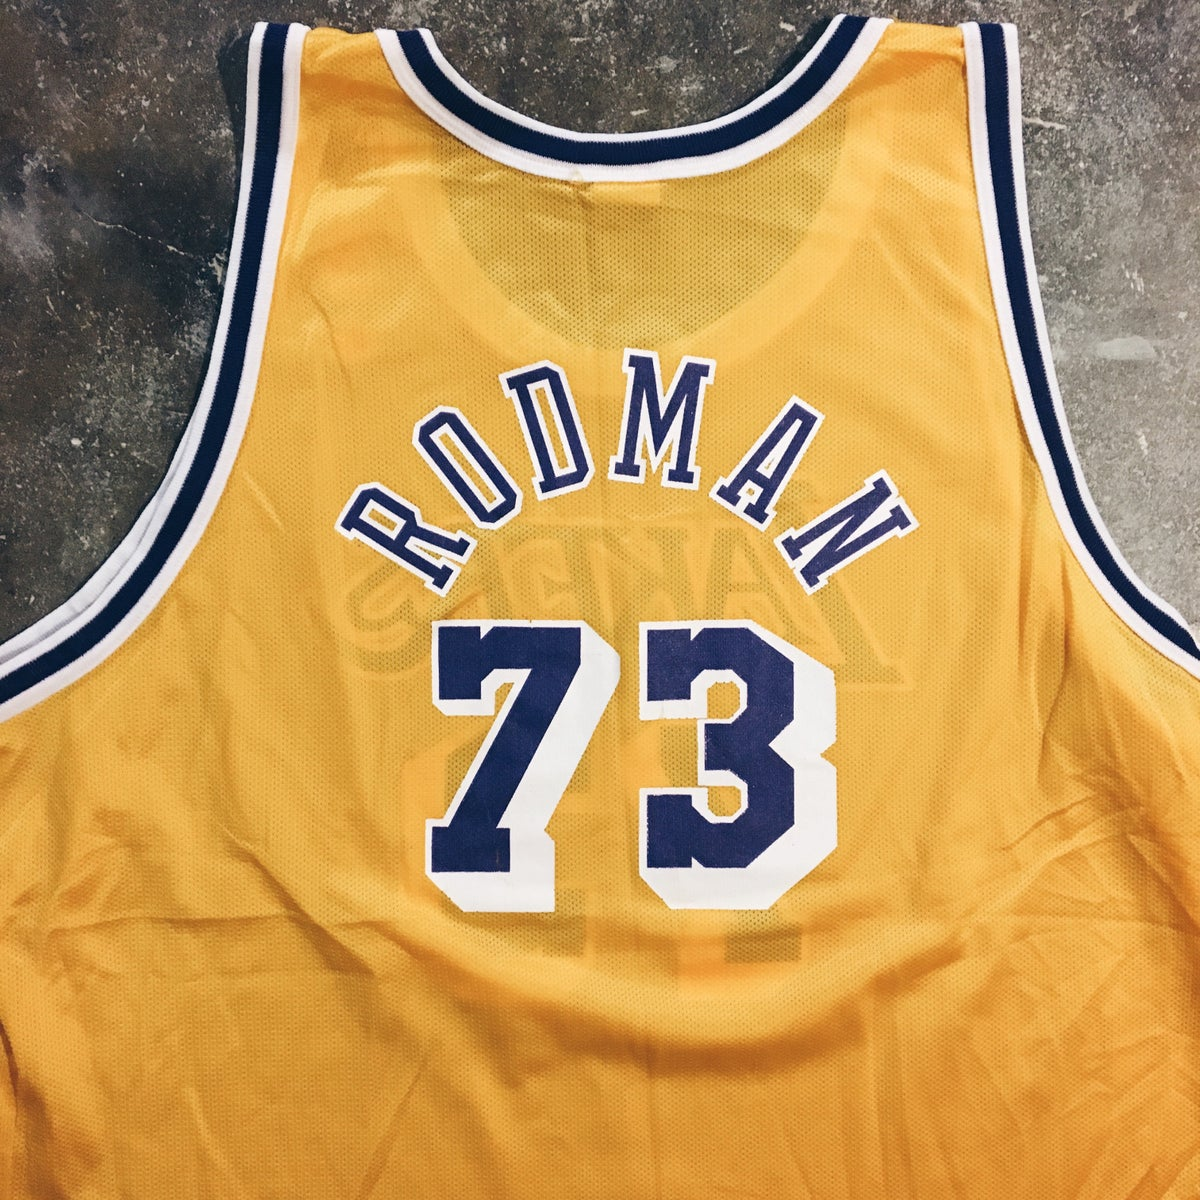 Image of Original 90's Champion Dennis Rodman Champion Jersey.